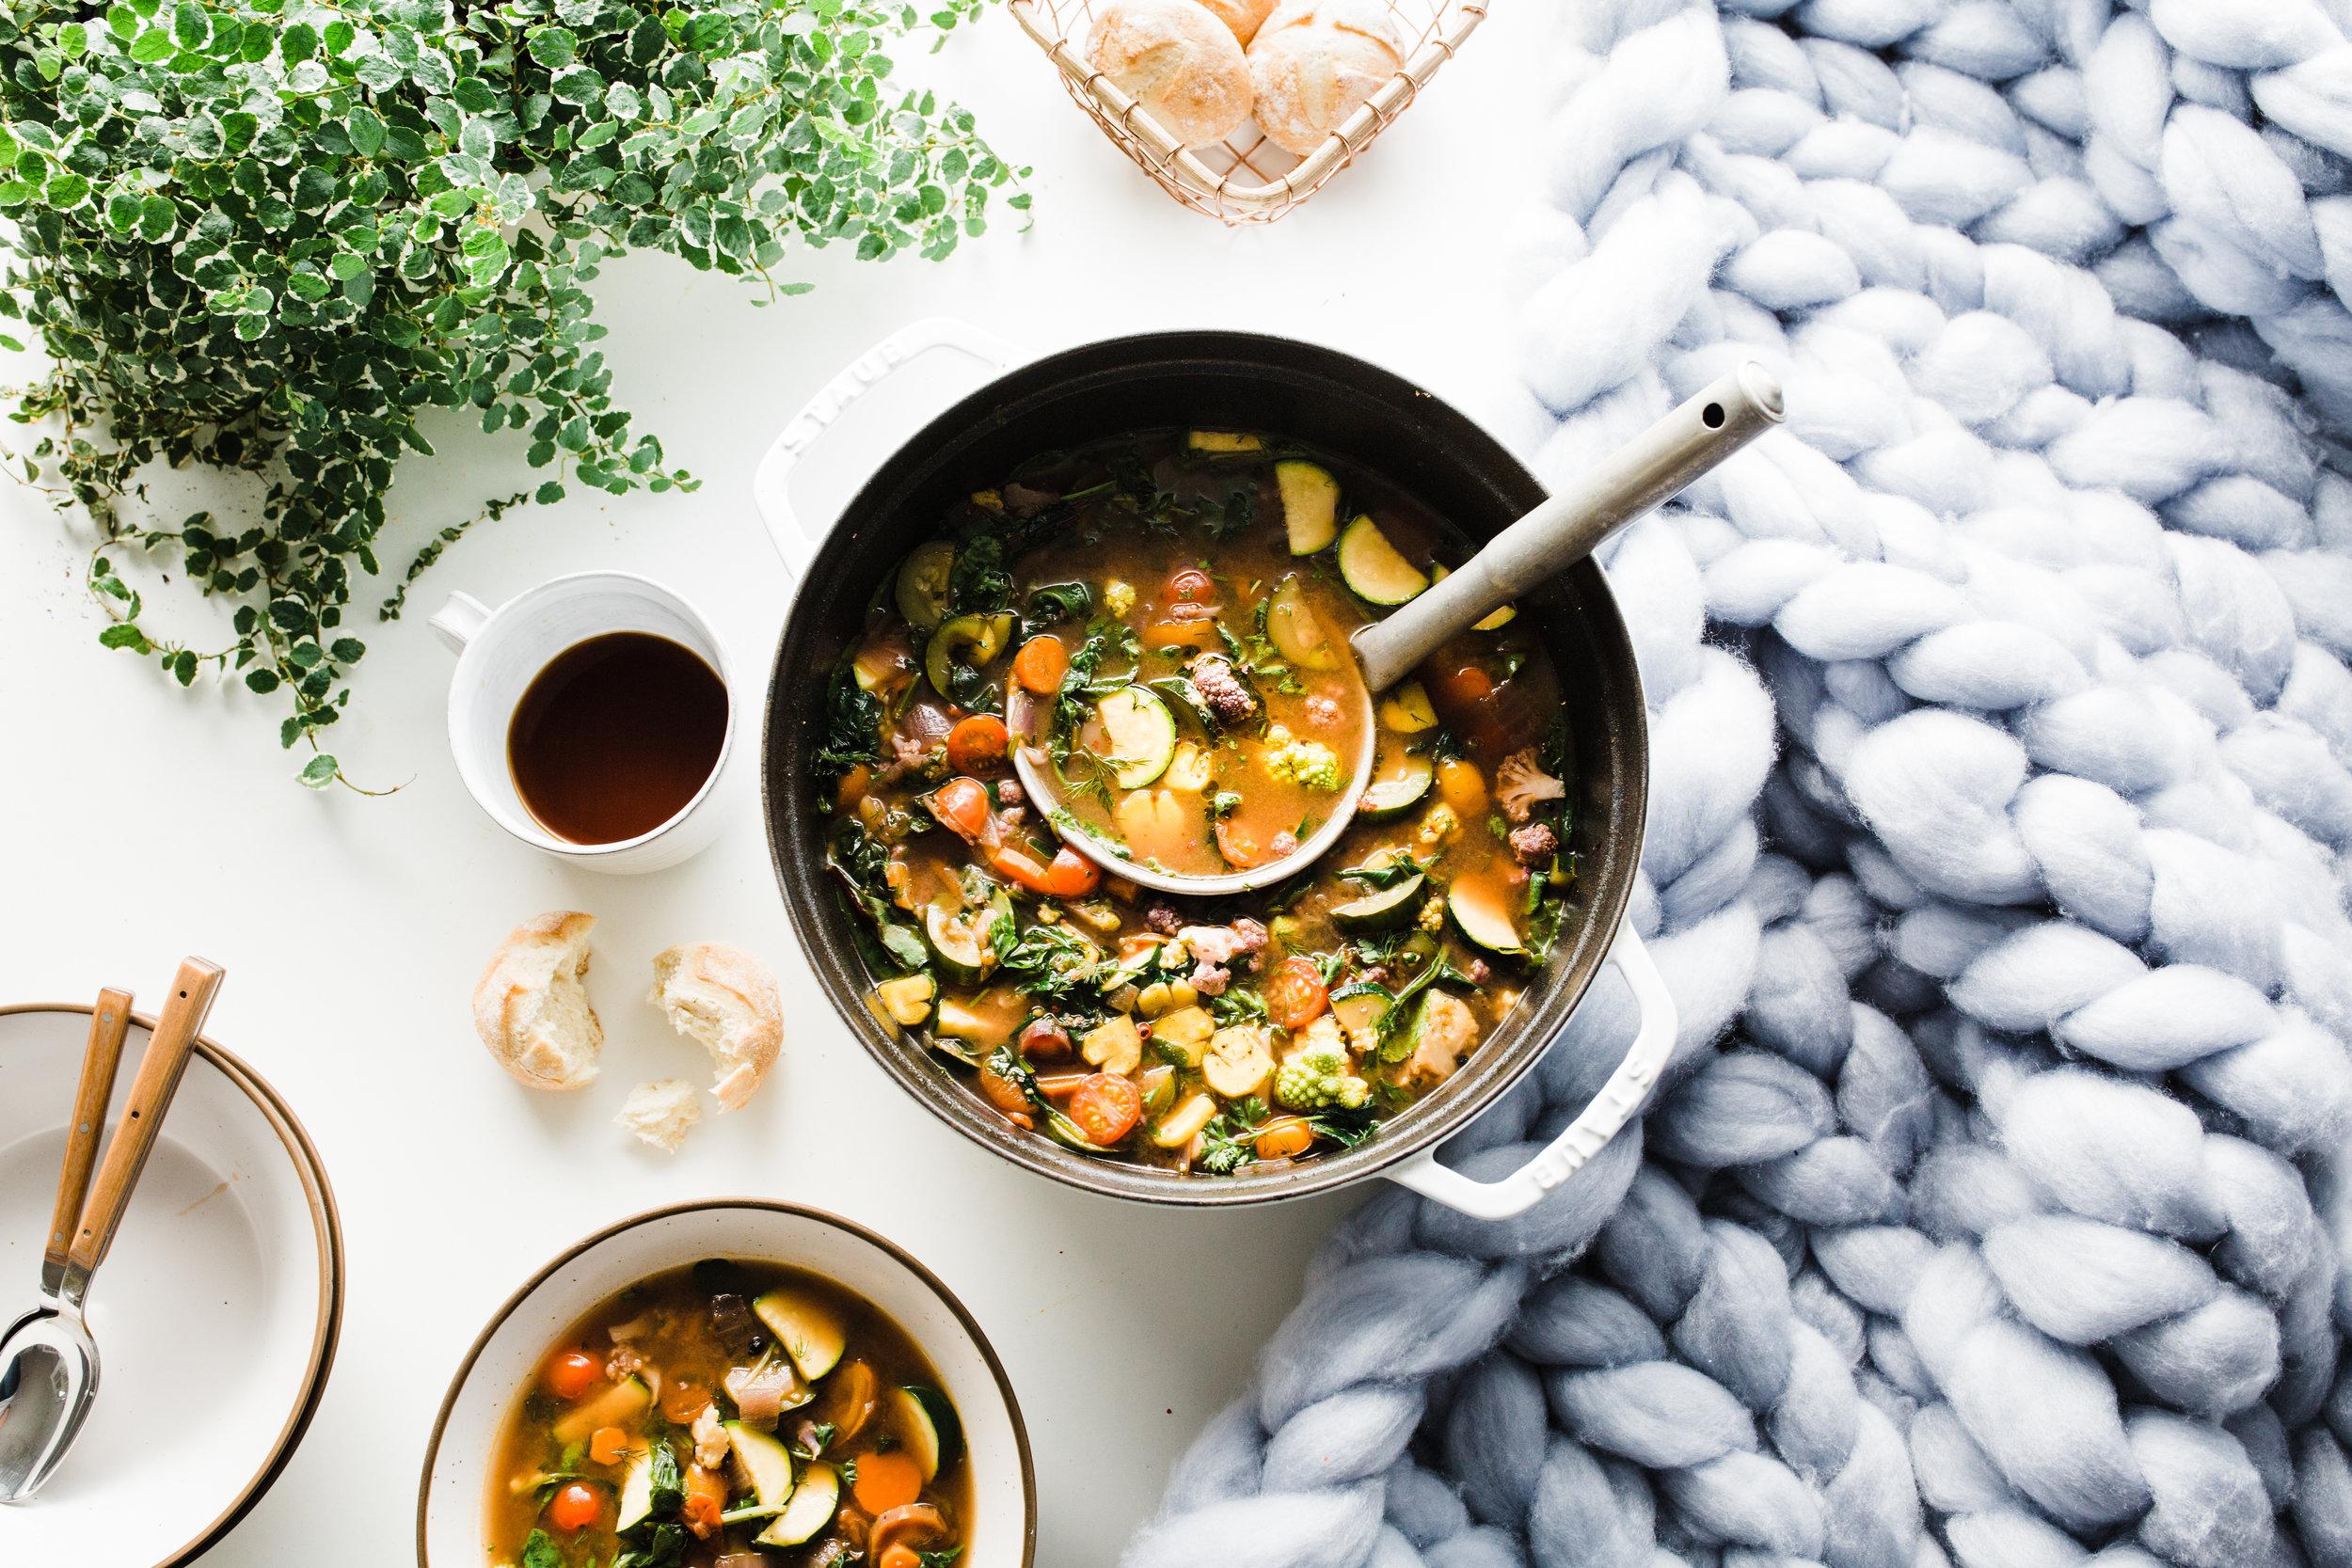 I Heart Veggies Soup (Low-Carb, Vegetarian, Keto)